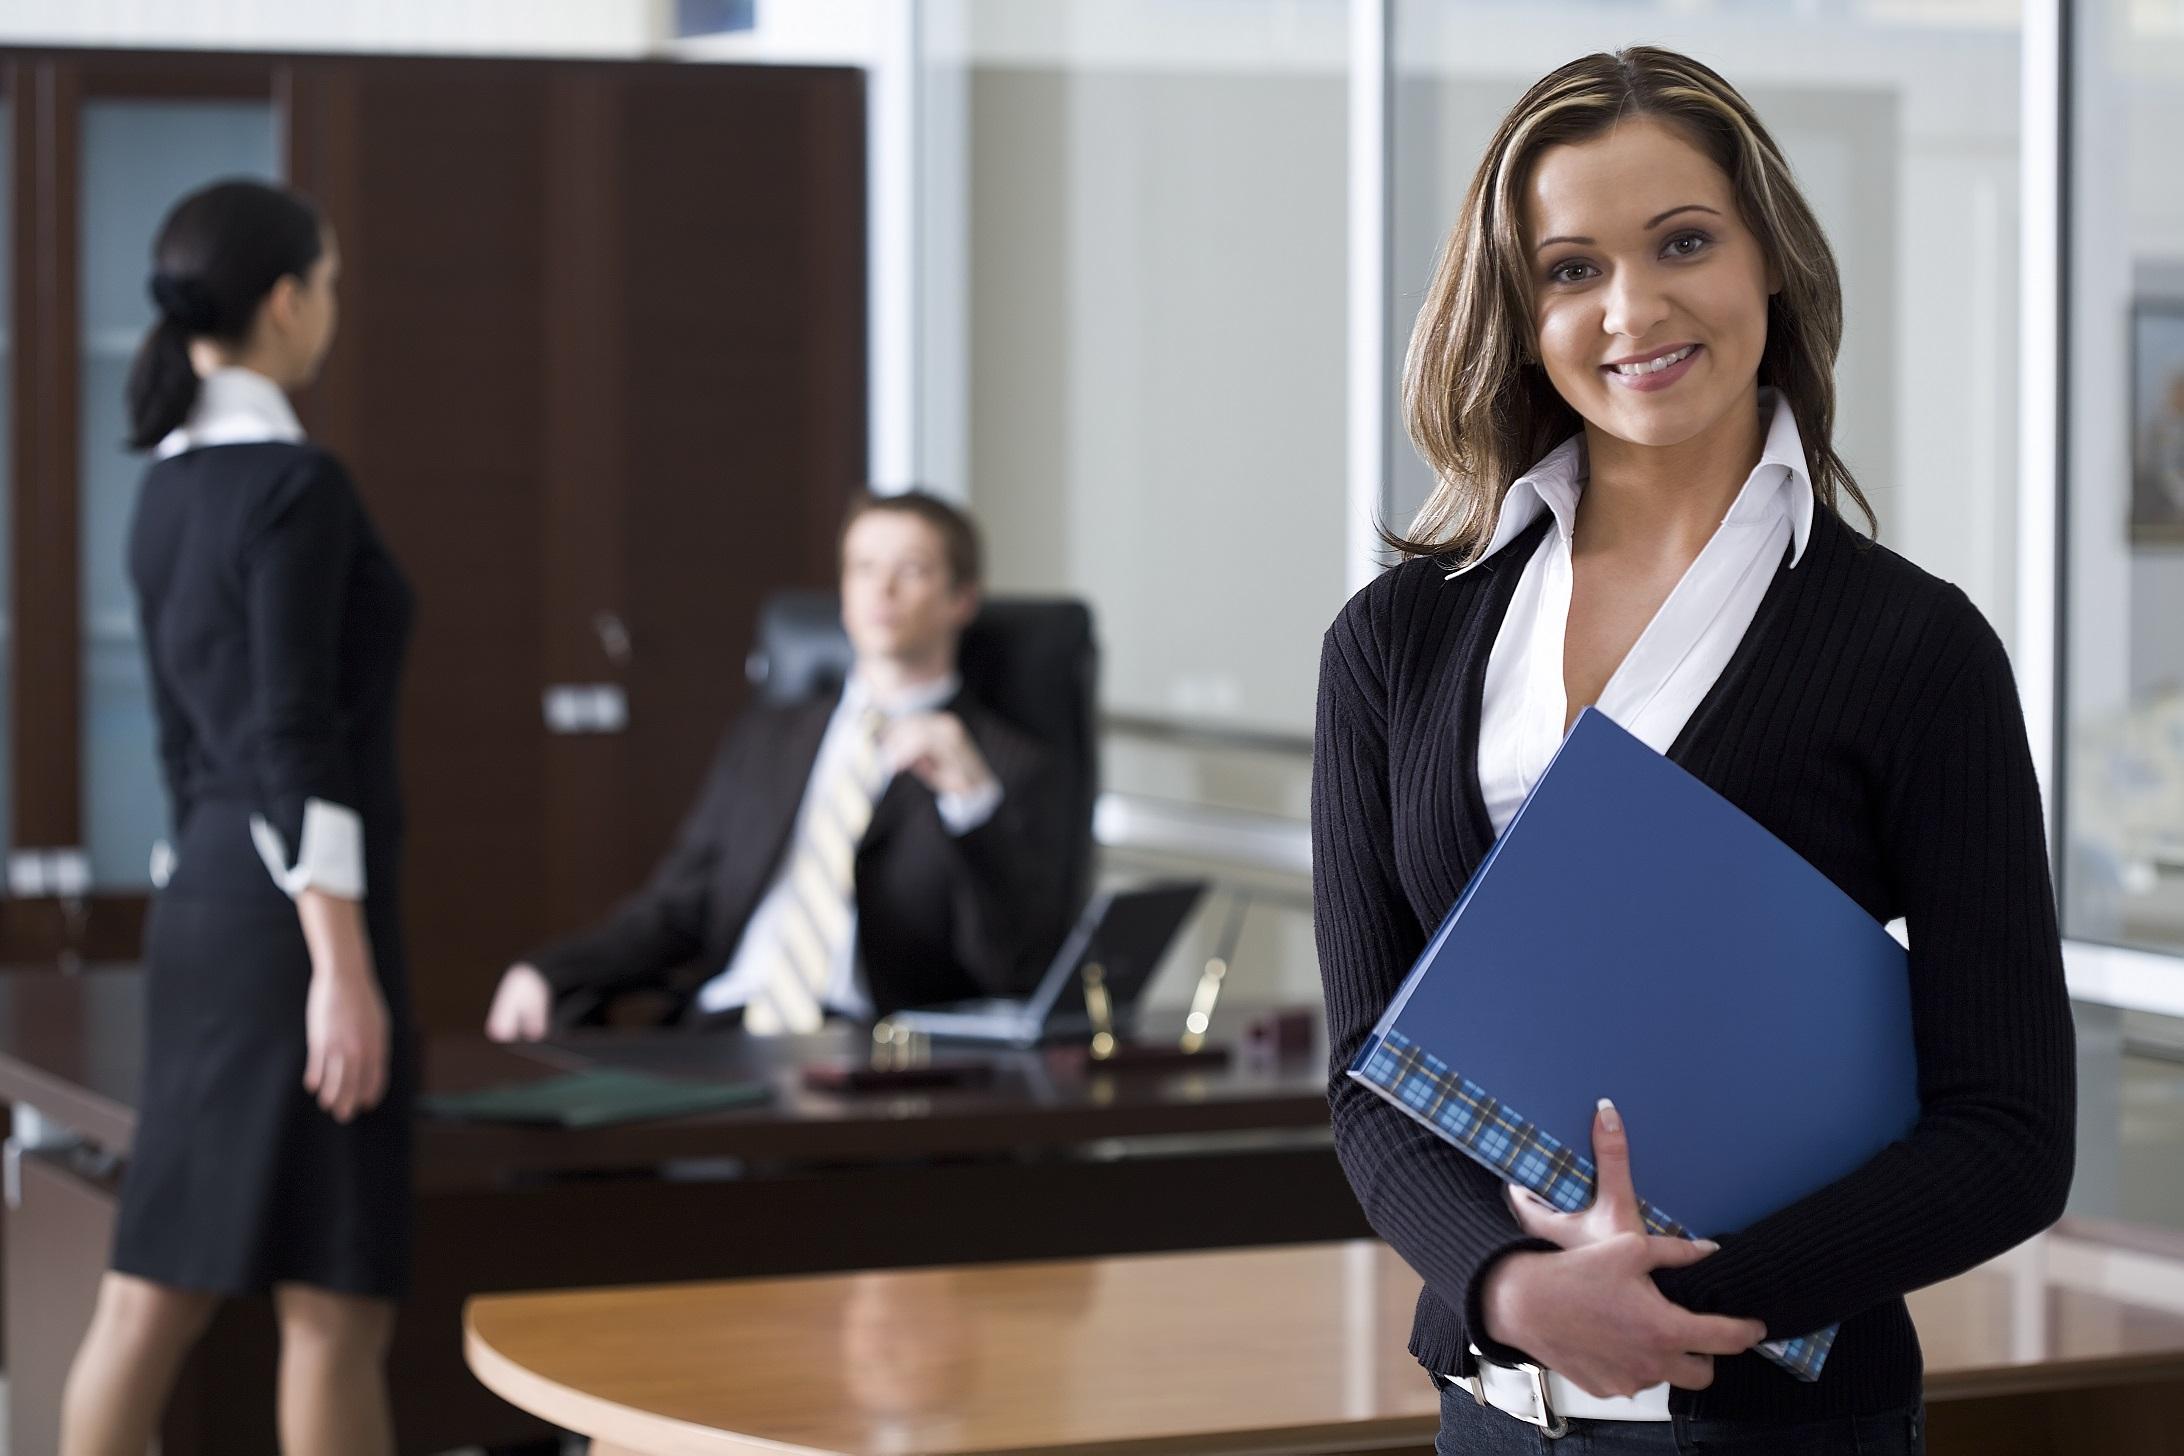 bigstock-Successful-Business-Plan-1581900.jpg